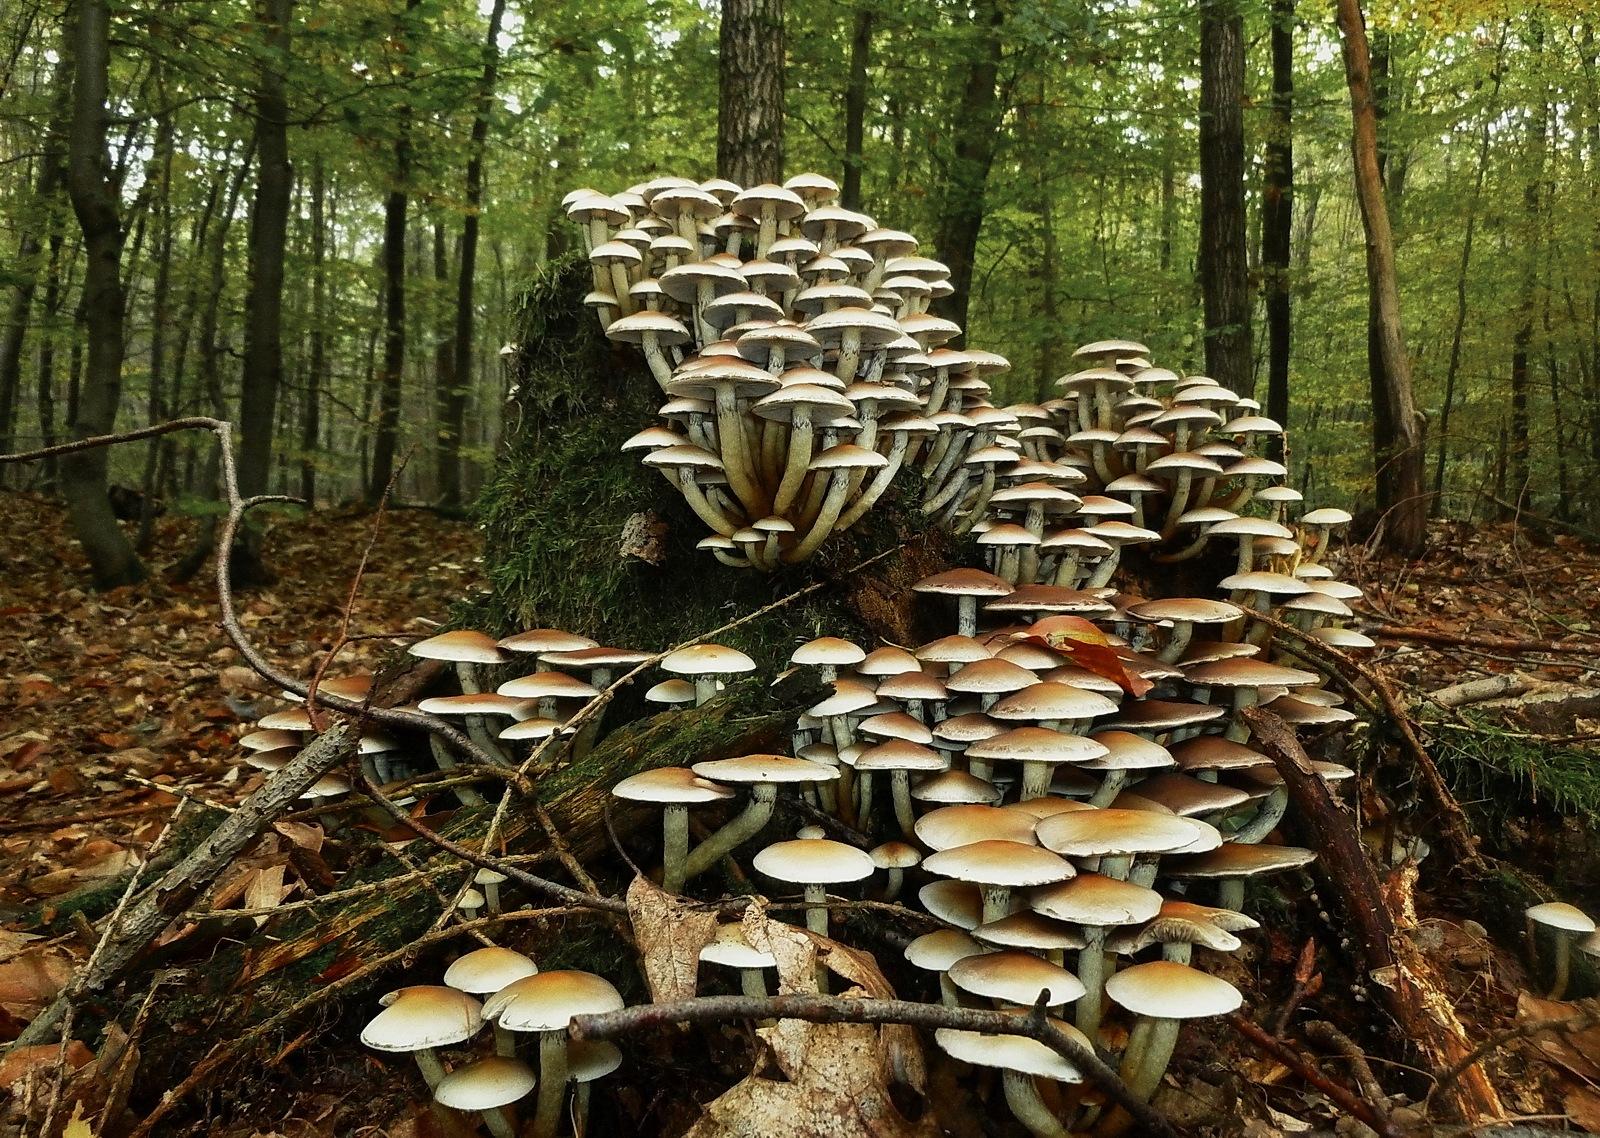 Mushroom tower by MonikaH